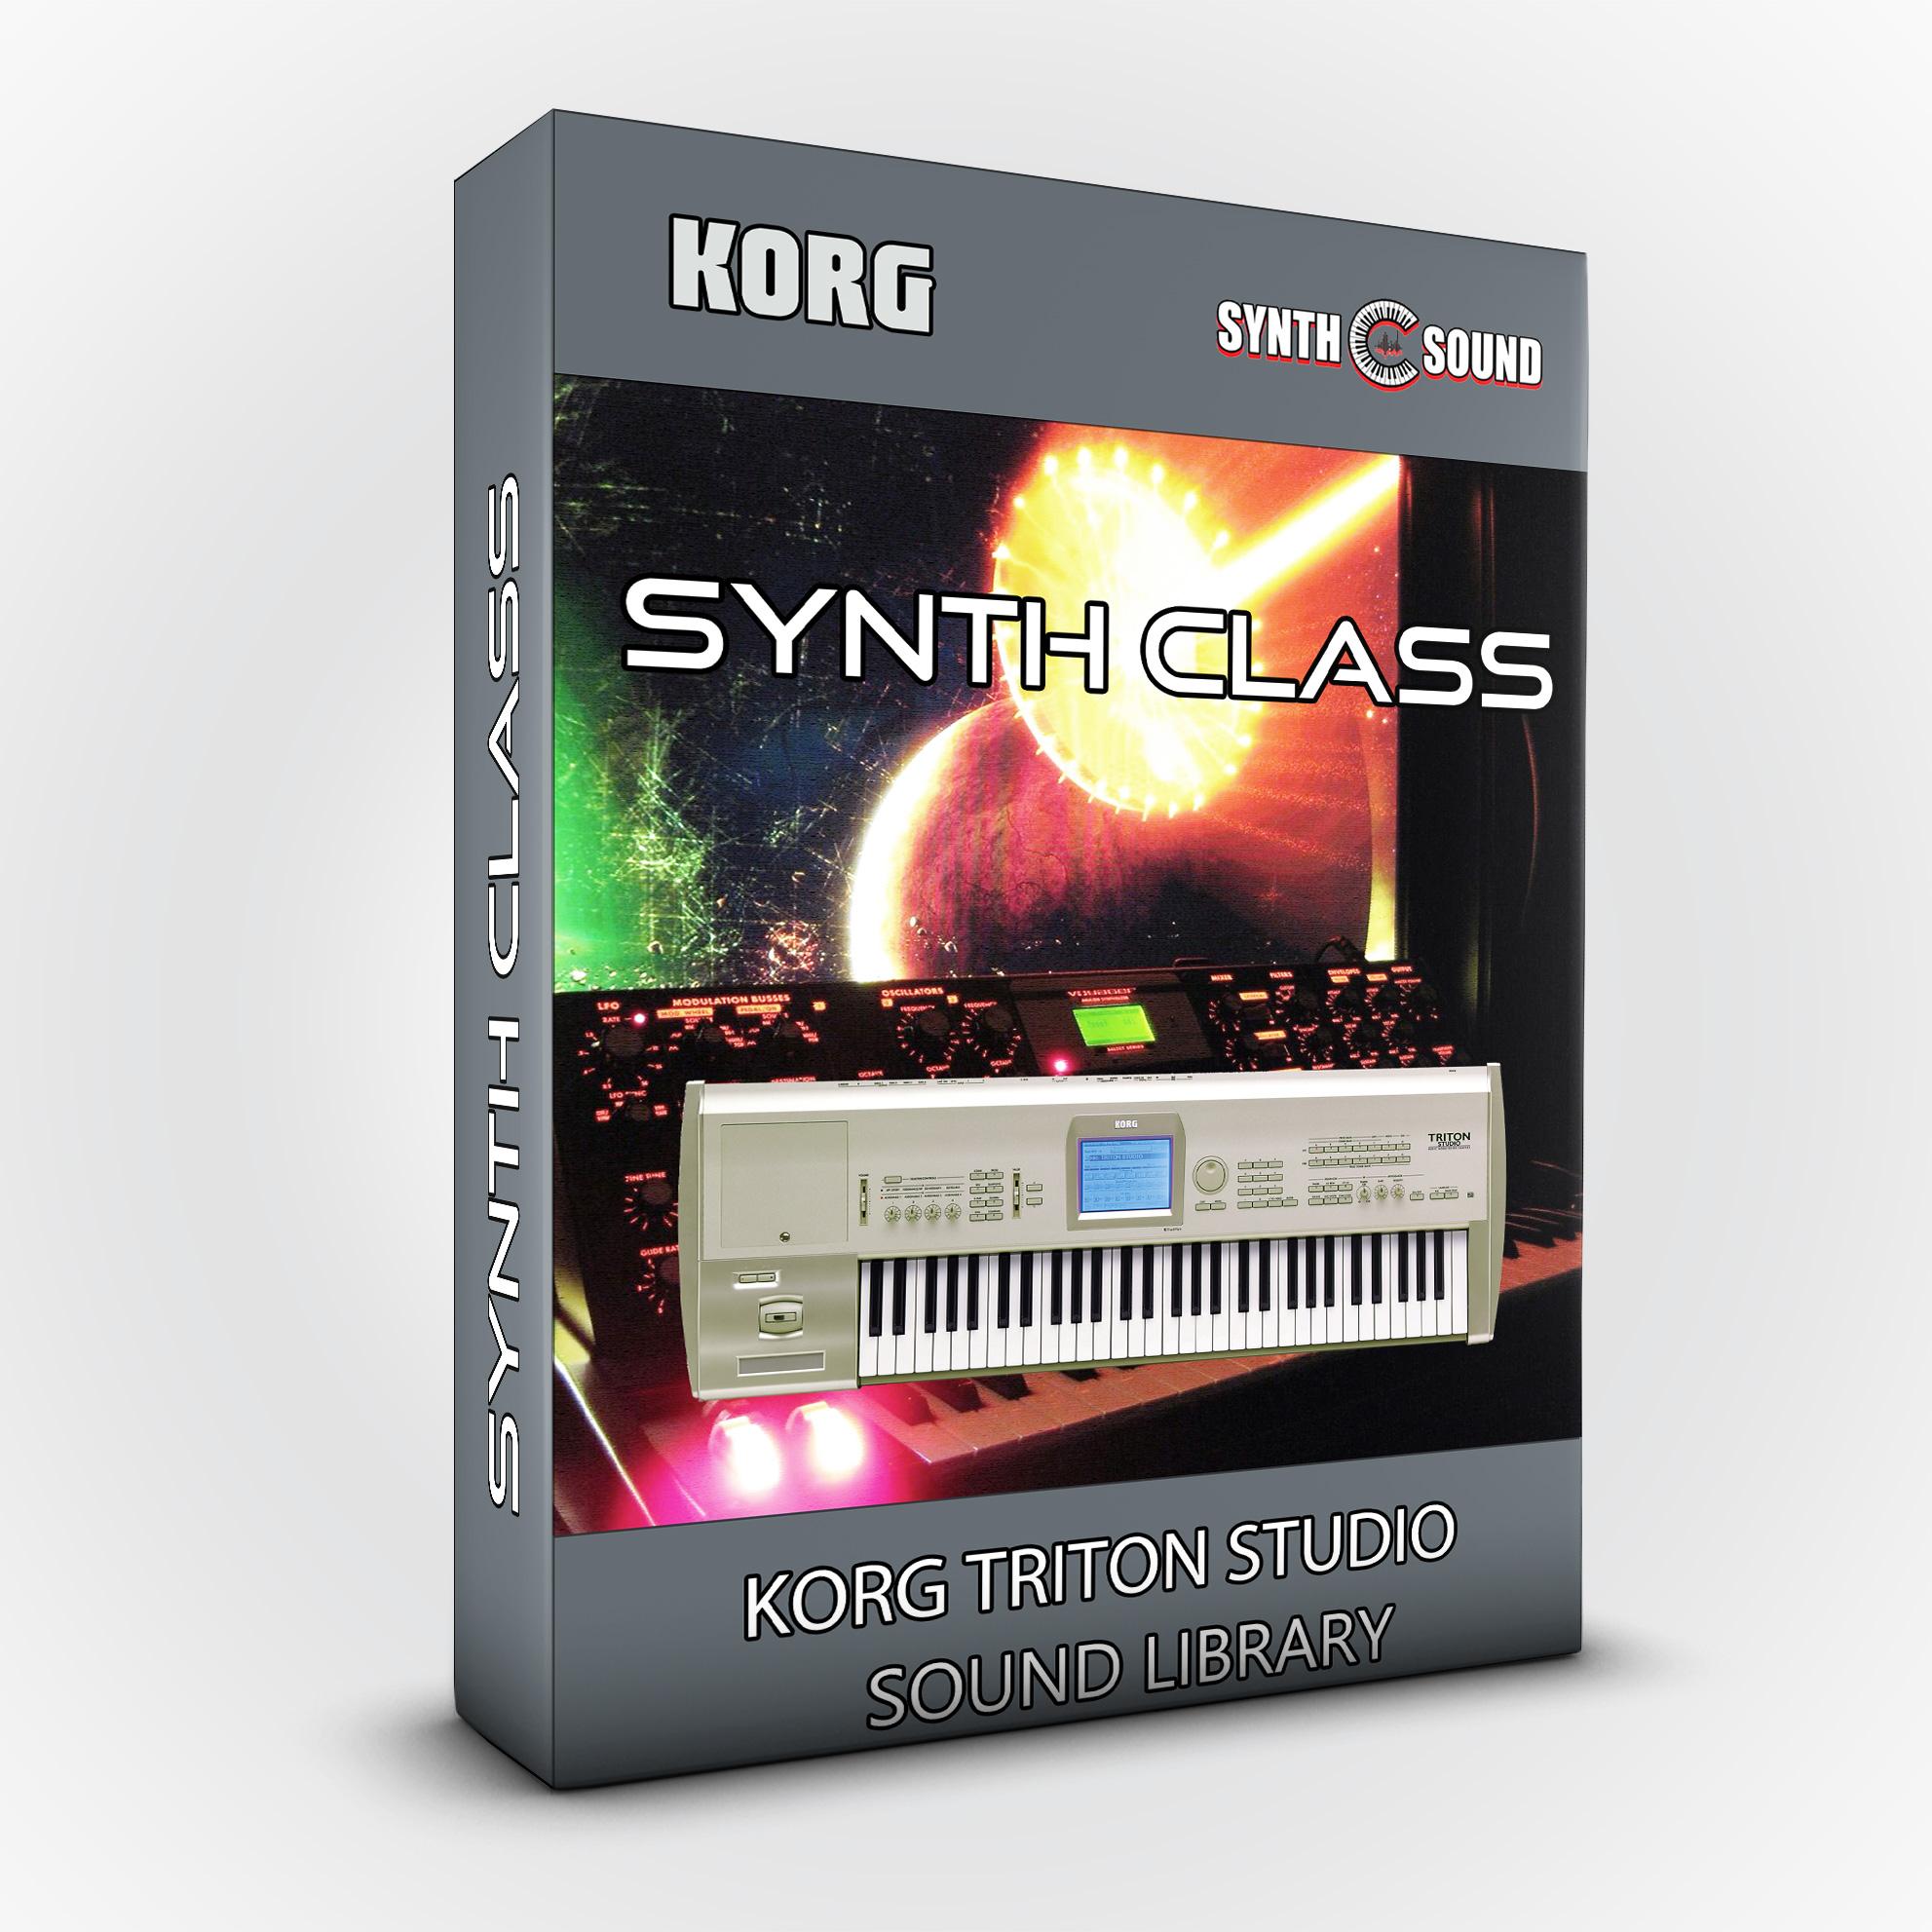 SSX113 - Synth Class - Korg Triton STUDIO